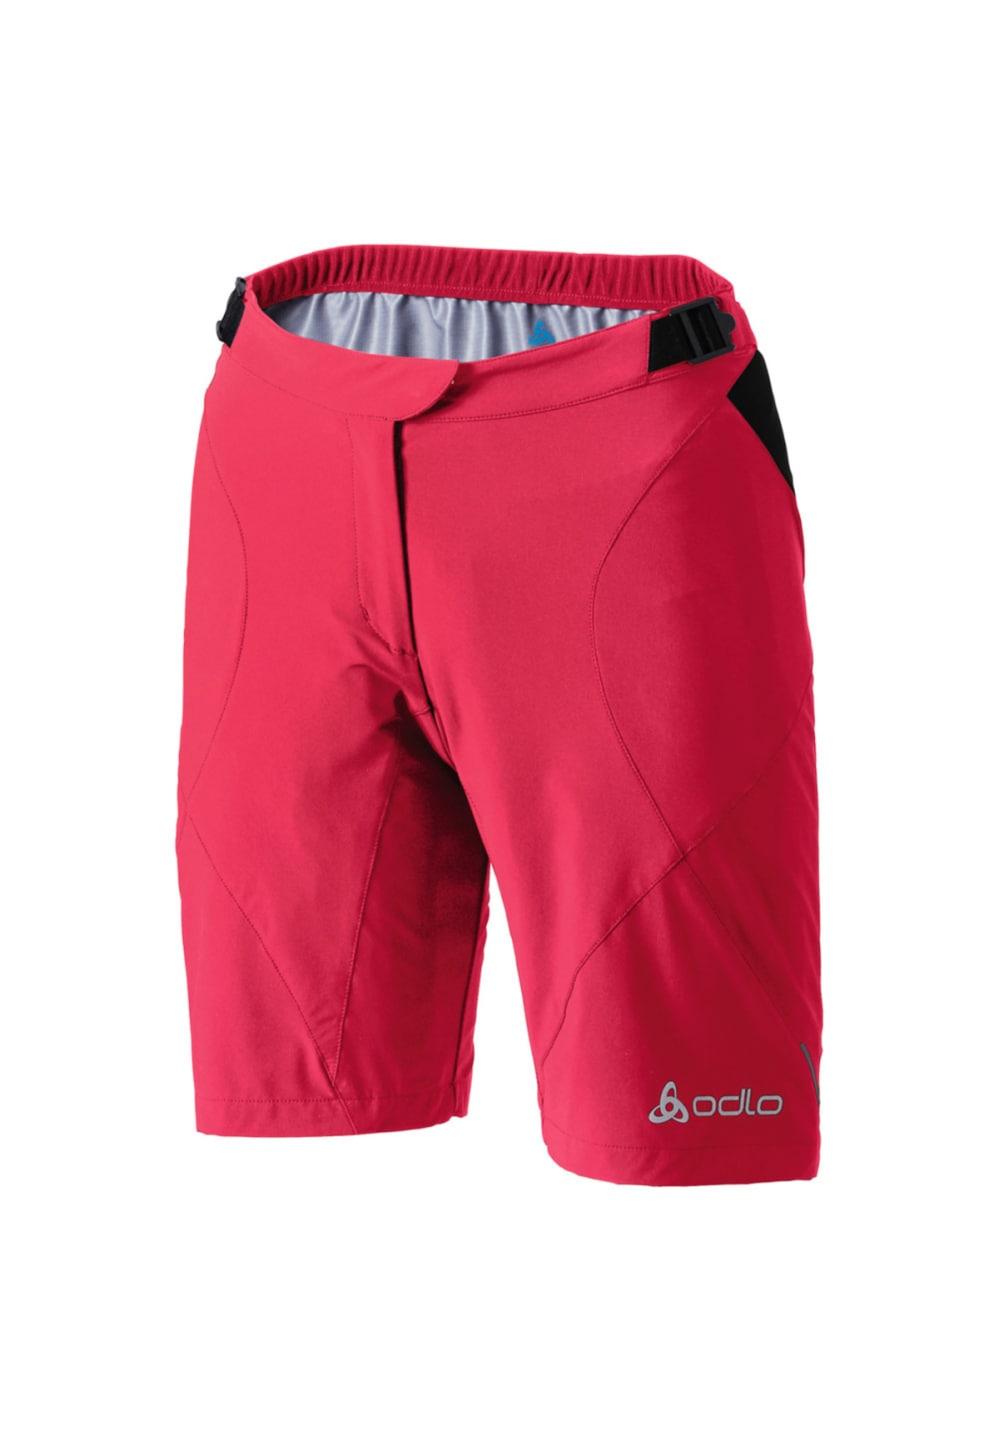 Odlo Shorts Flo - Triathlon für Damen - Rot